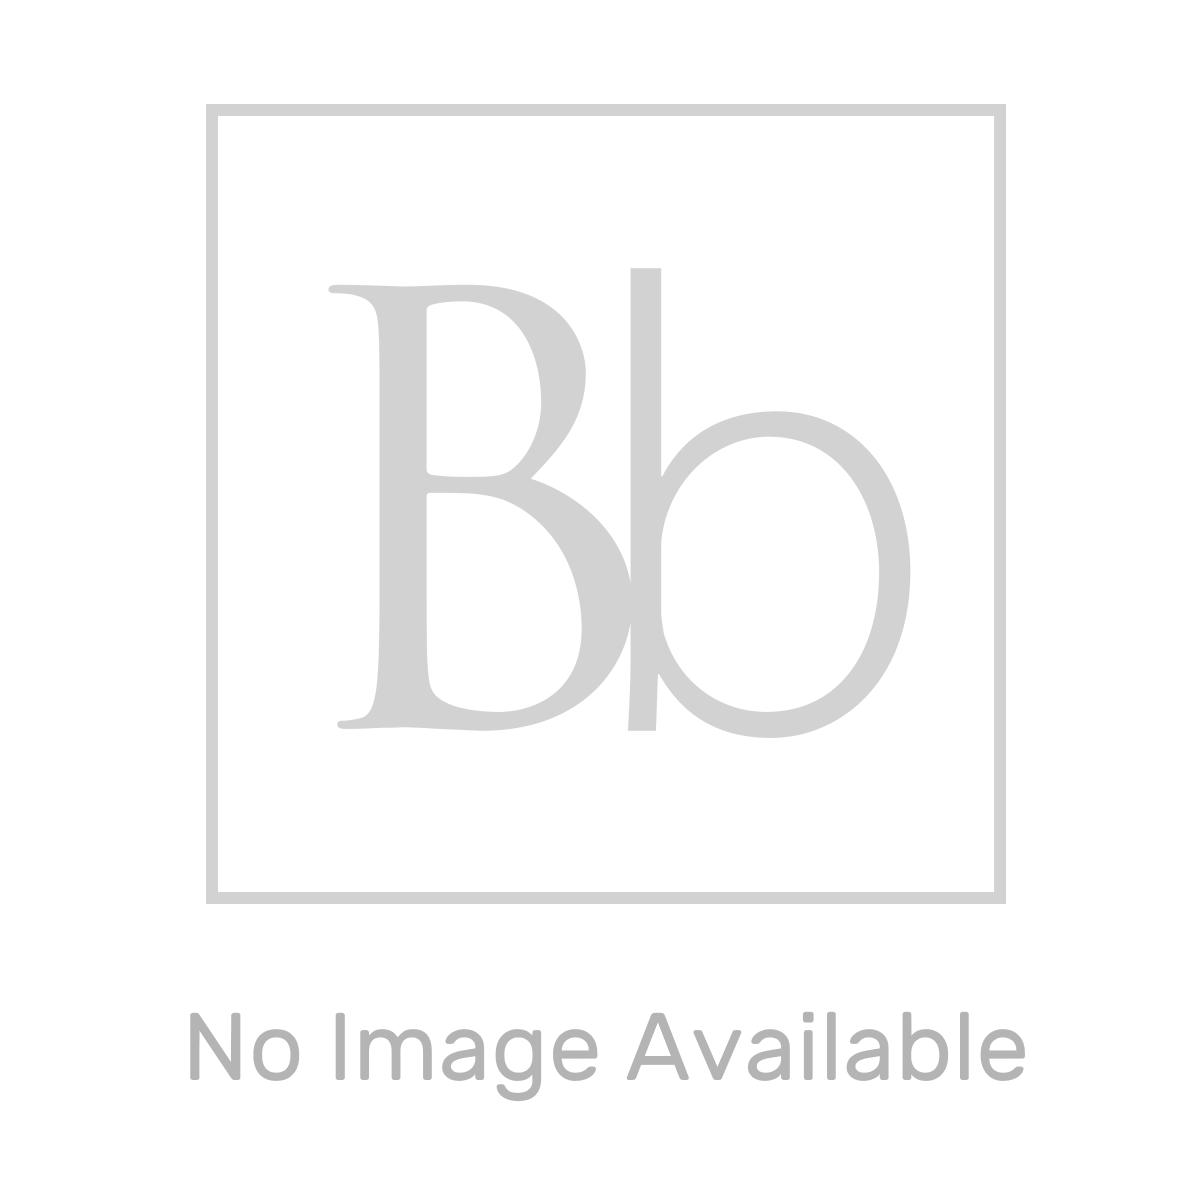 RAK Washington 1 Tap Hole Basin with Full Pedestal 560mm Drawing